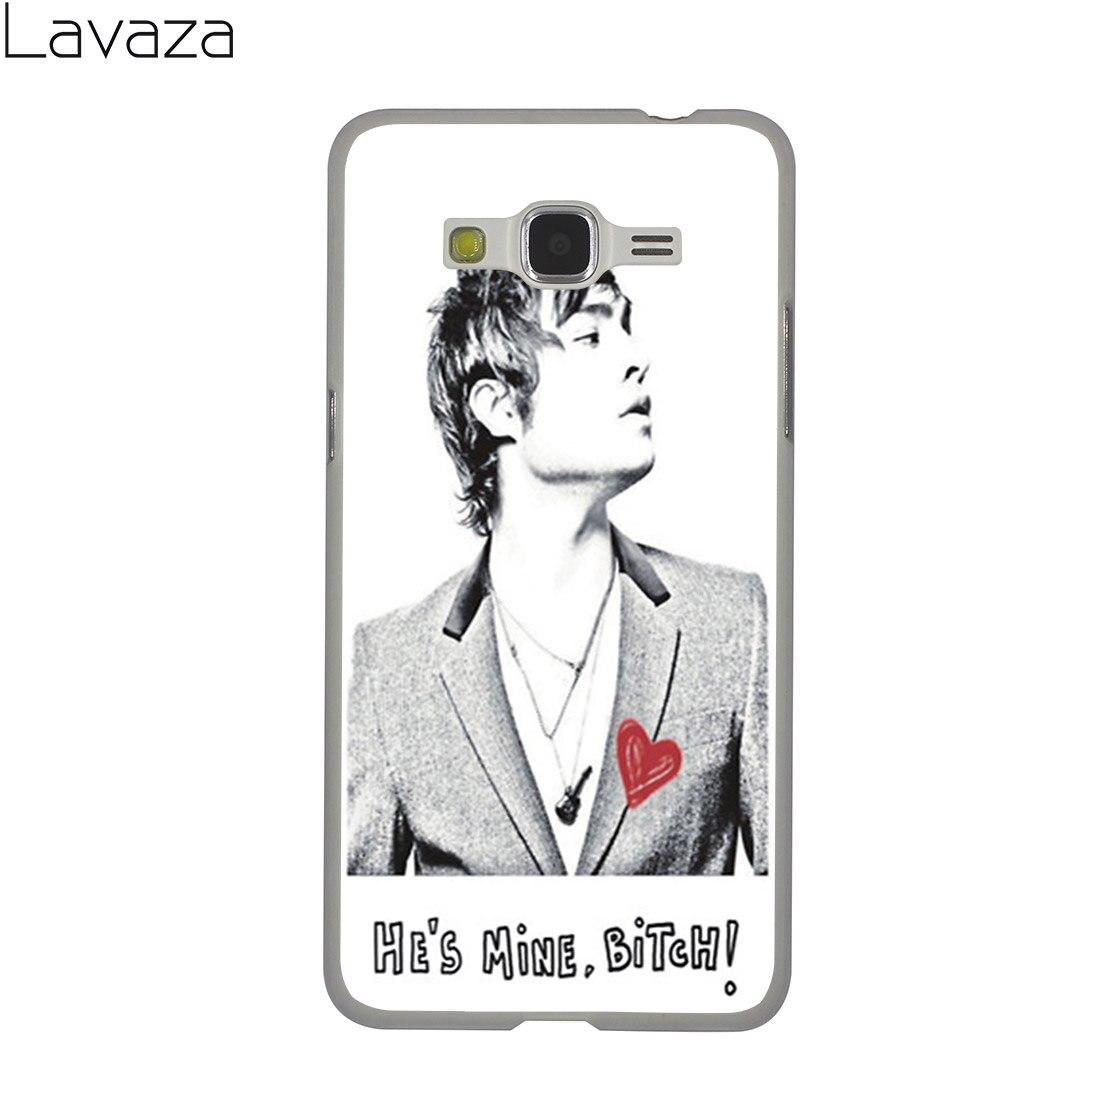 Lavaza Gossip Girl blair and chuck Case for Samsung Galaxy A3 A5 A7 A8 2015 2016 2017 2018 Note 8 5 4 3 2 Grand Prime